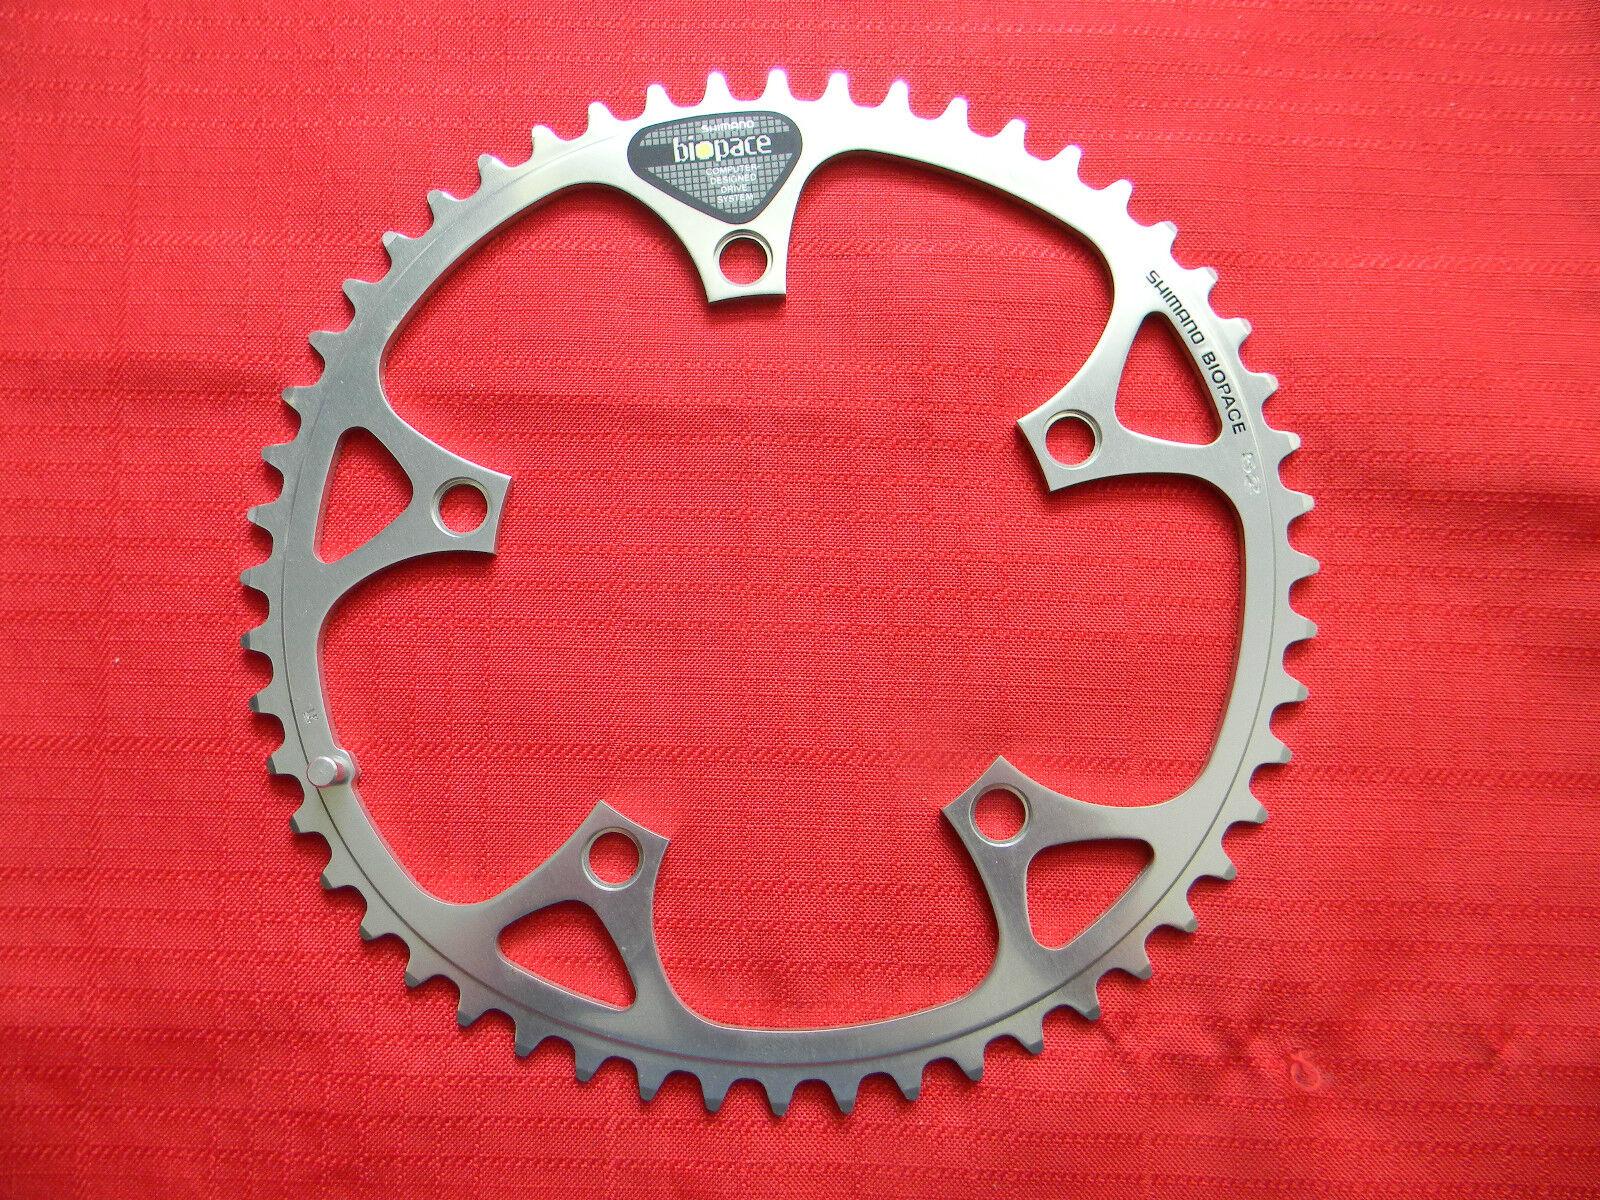 Vintage Shimano Biopace Chain Ring, LD Type 130mm Bolt Circle Dia. Teeth 52 LD